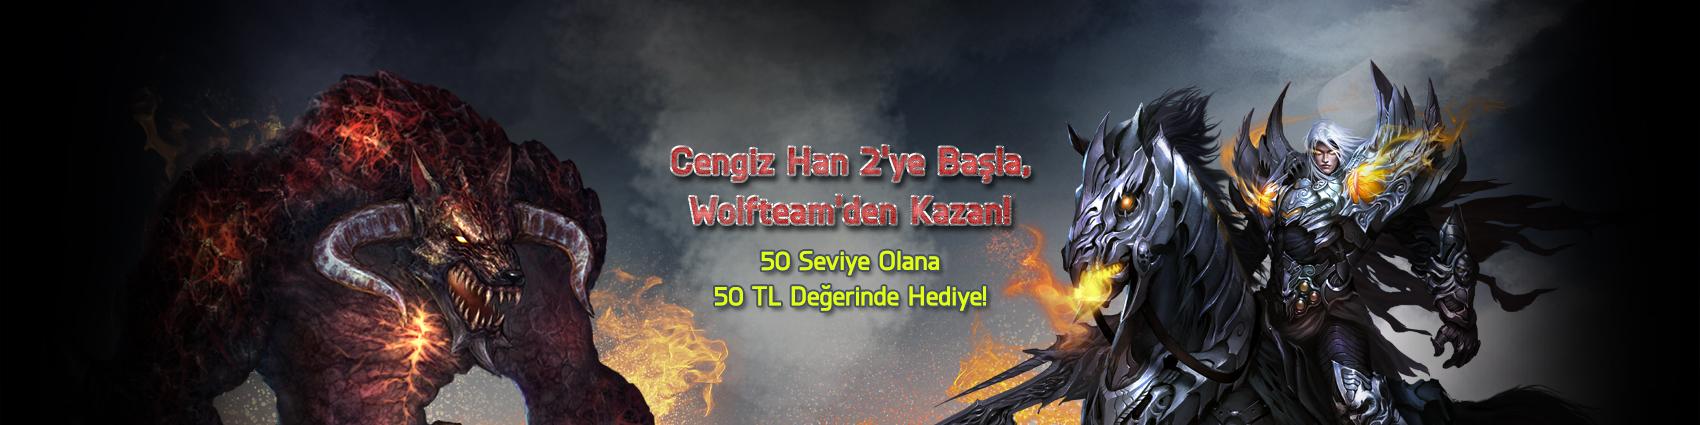 Cengiz Han 2 Oyna, Wolfteam'den Kazan!